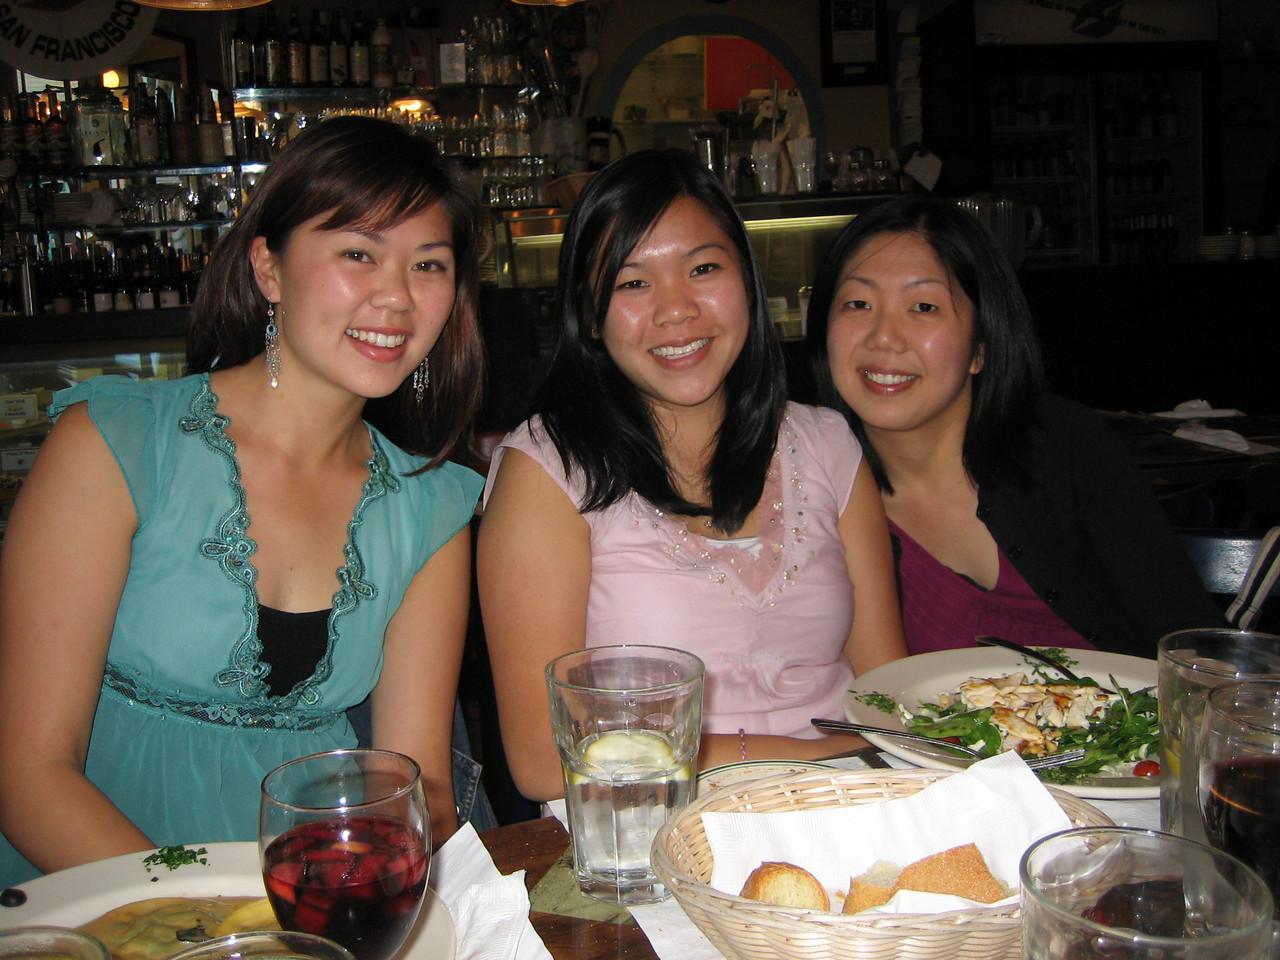 2005 06 04 Saturday - Tiffany Louie, Rhonda Mar, & Lisa Chang